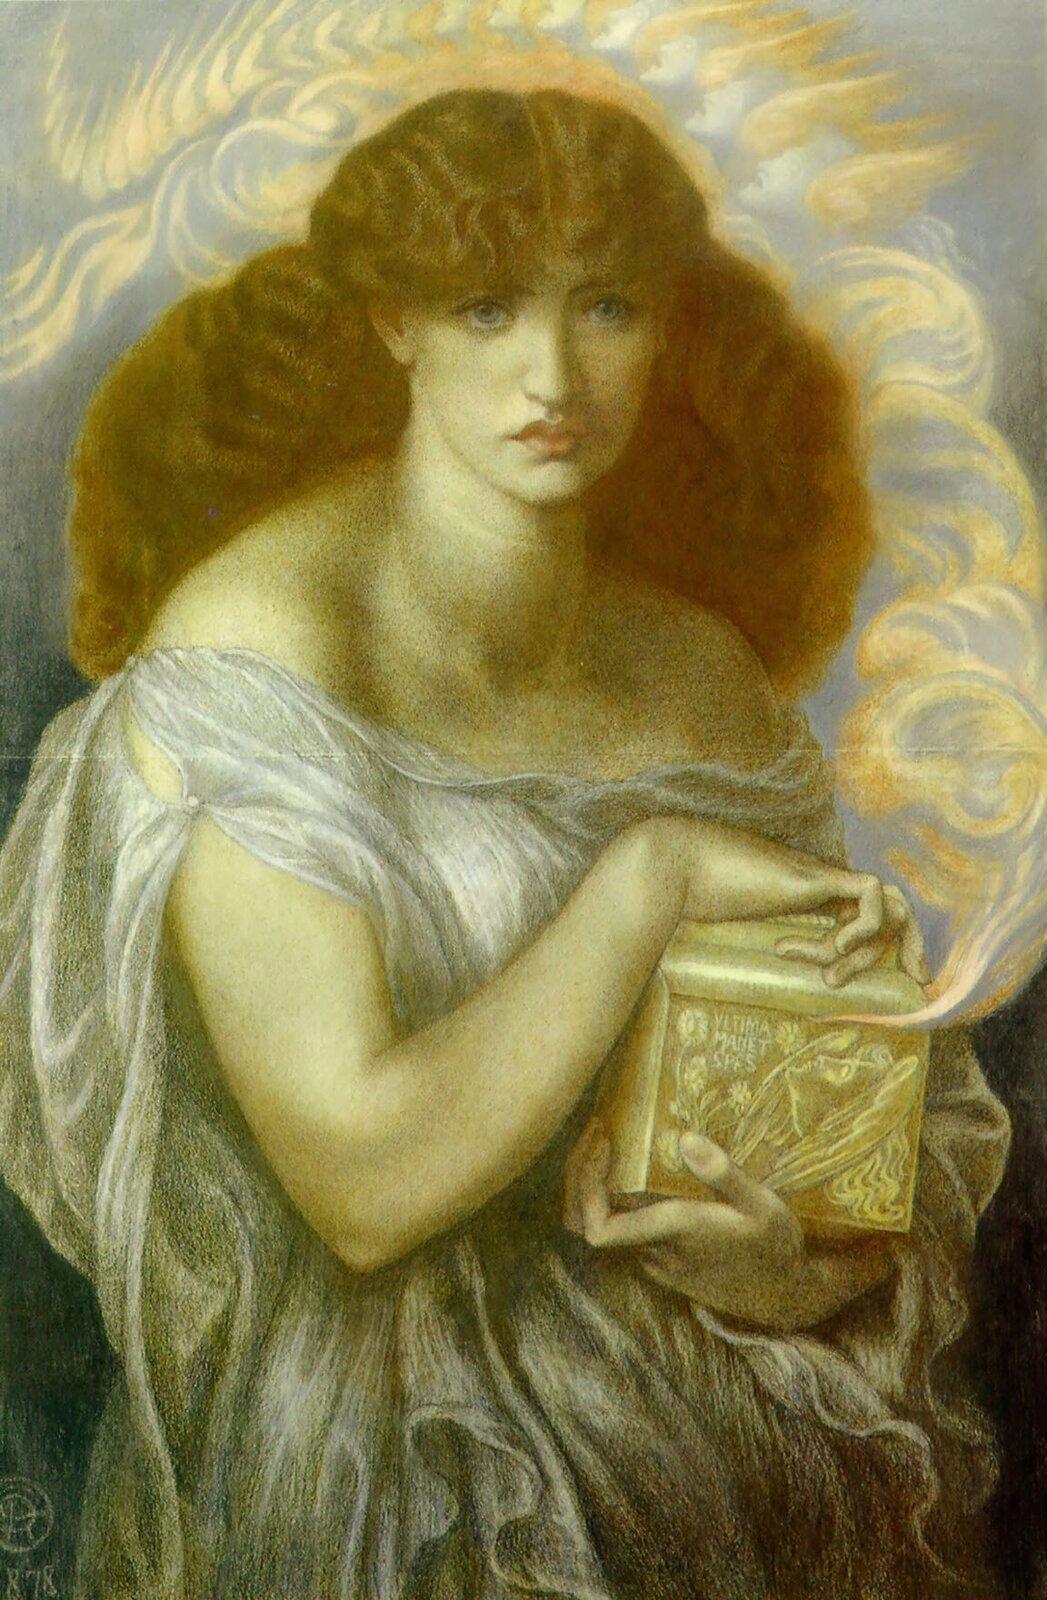 Pandora Źródło: Dante Gabriel Rossetti, Pandora, 1879, Faringdon Collection, Buscot Park, domena publiczna.